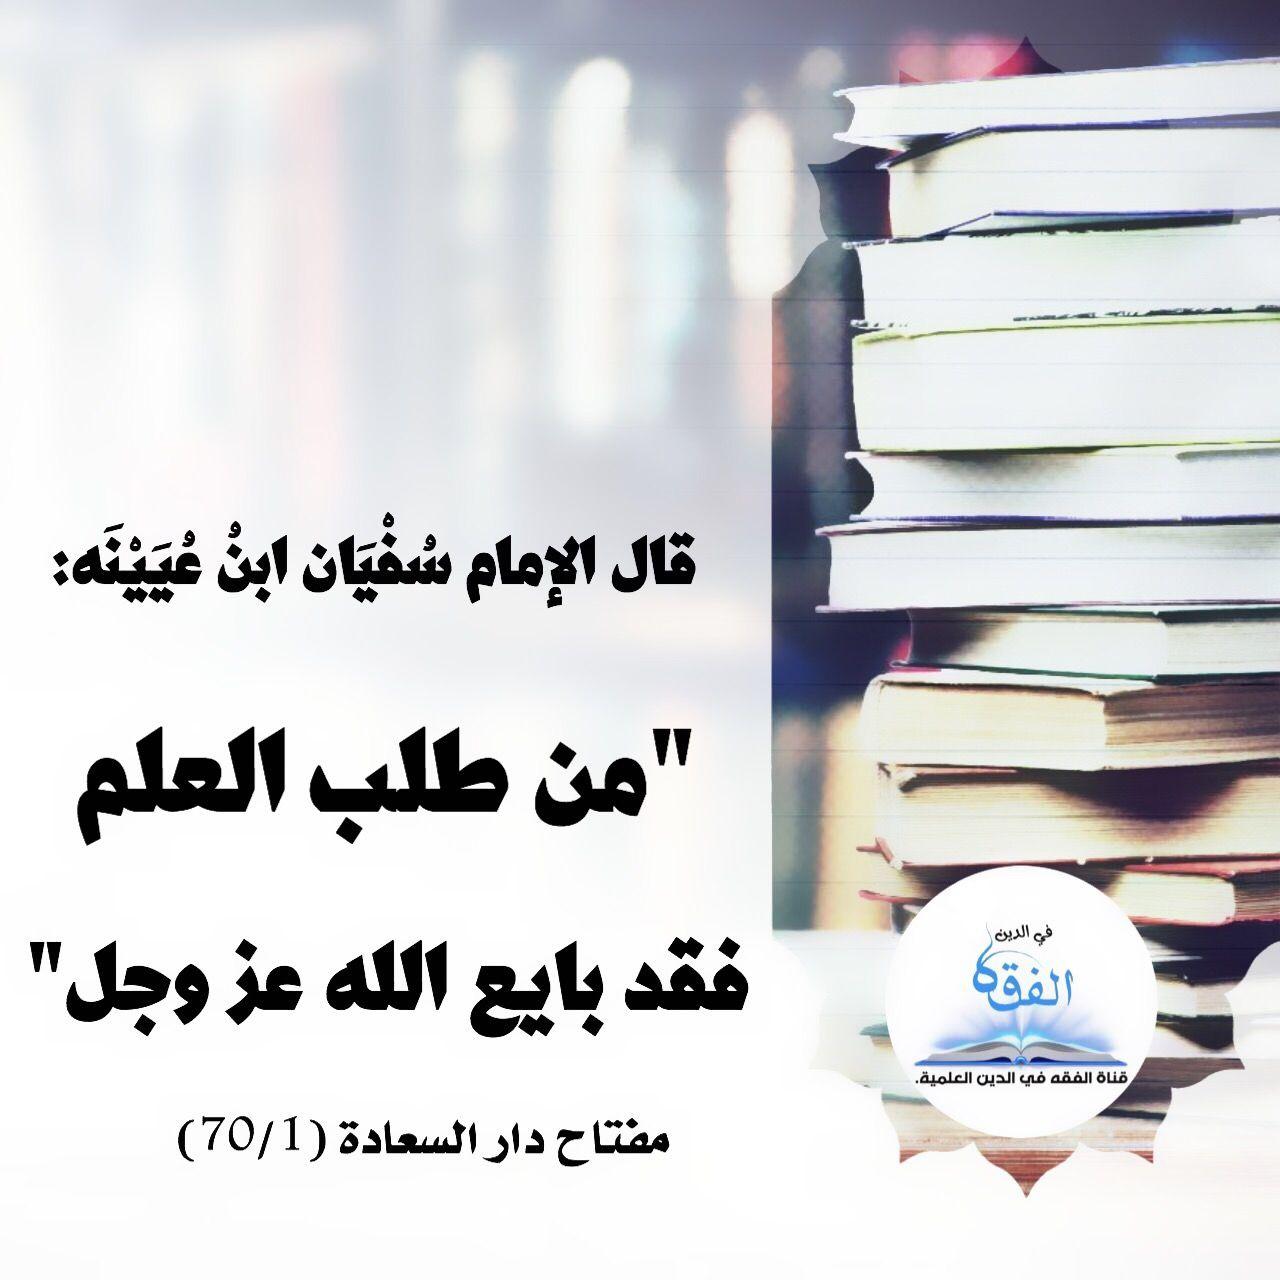 Pin By نشر الخير On و ذ ك ر ف إ ن الذ كرى ت نف ع الم ؤم نين Islamic Quotes Arabic Quotes Quotes